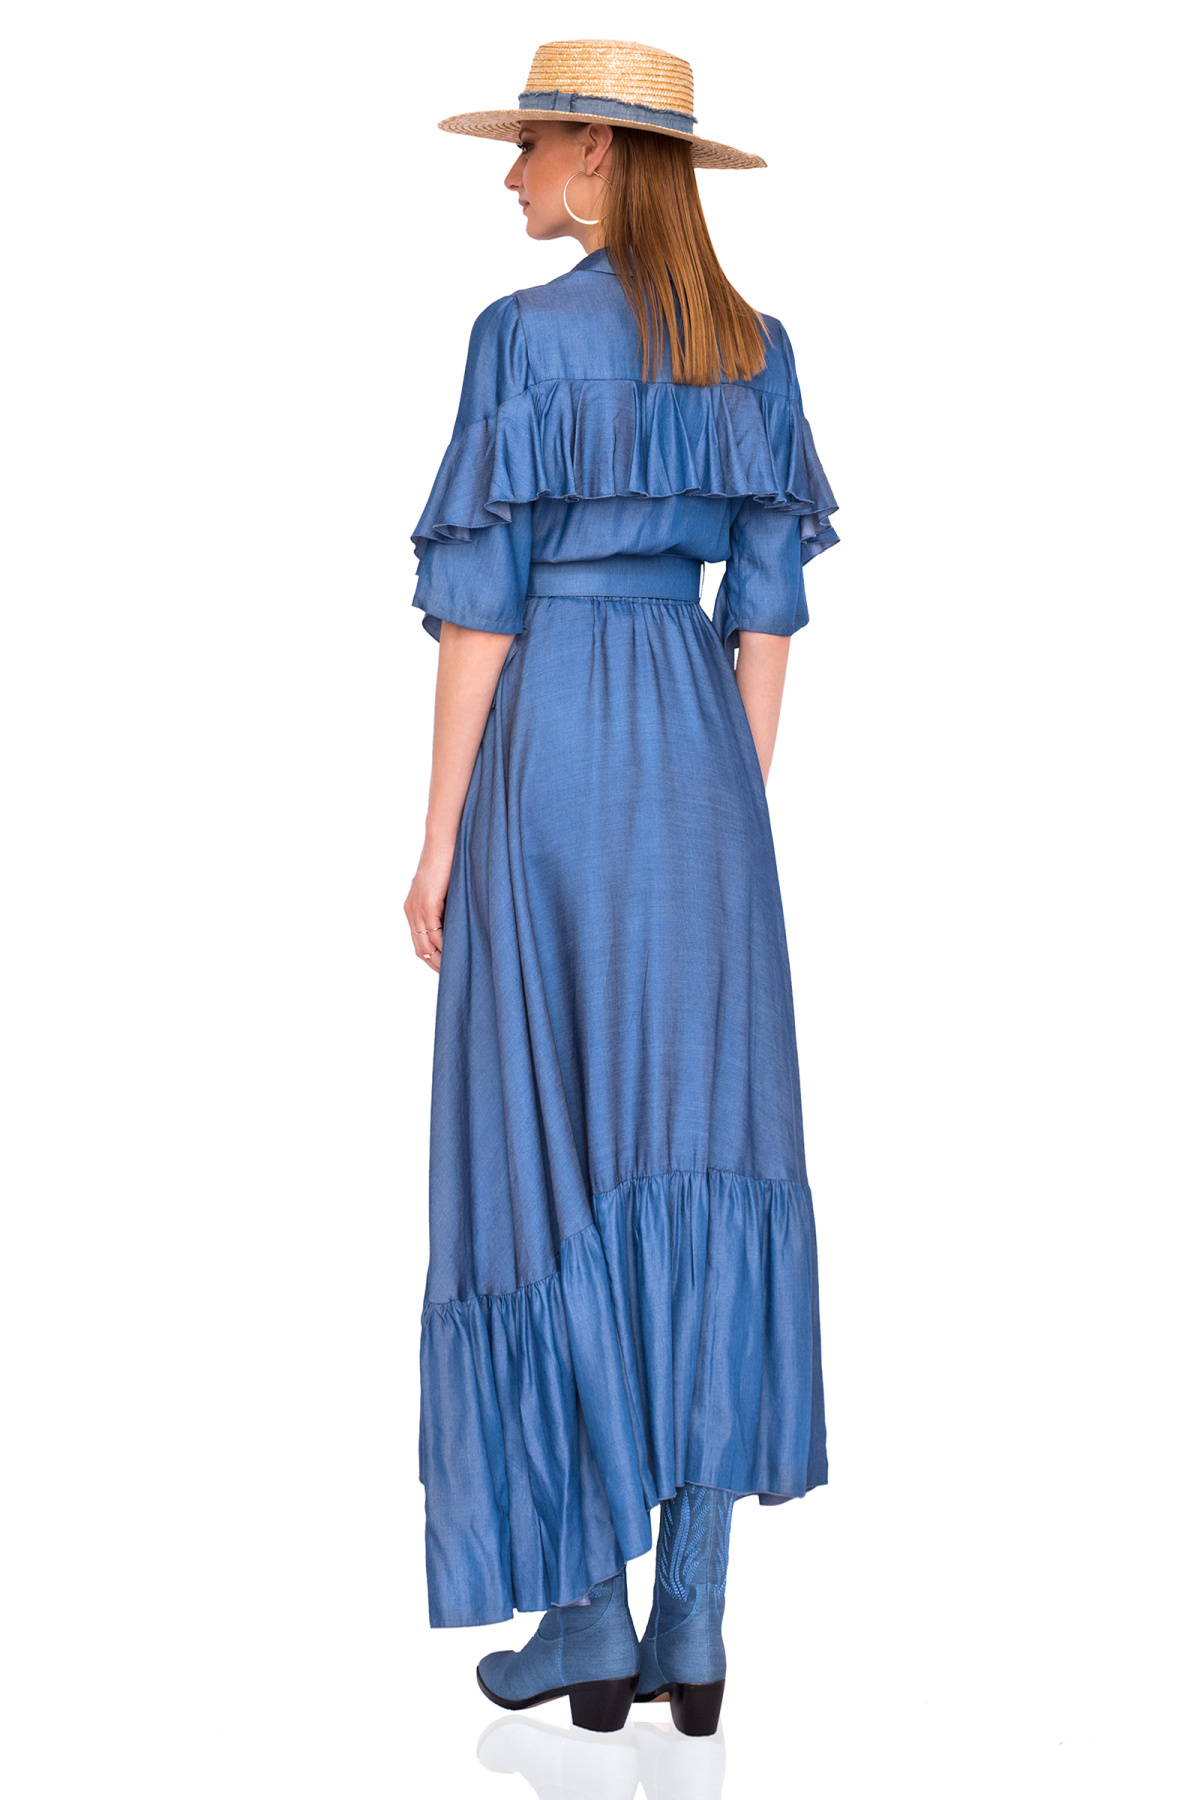 b9d7f7f4d0 Denim dress with ruffled sleeves